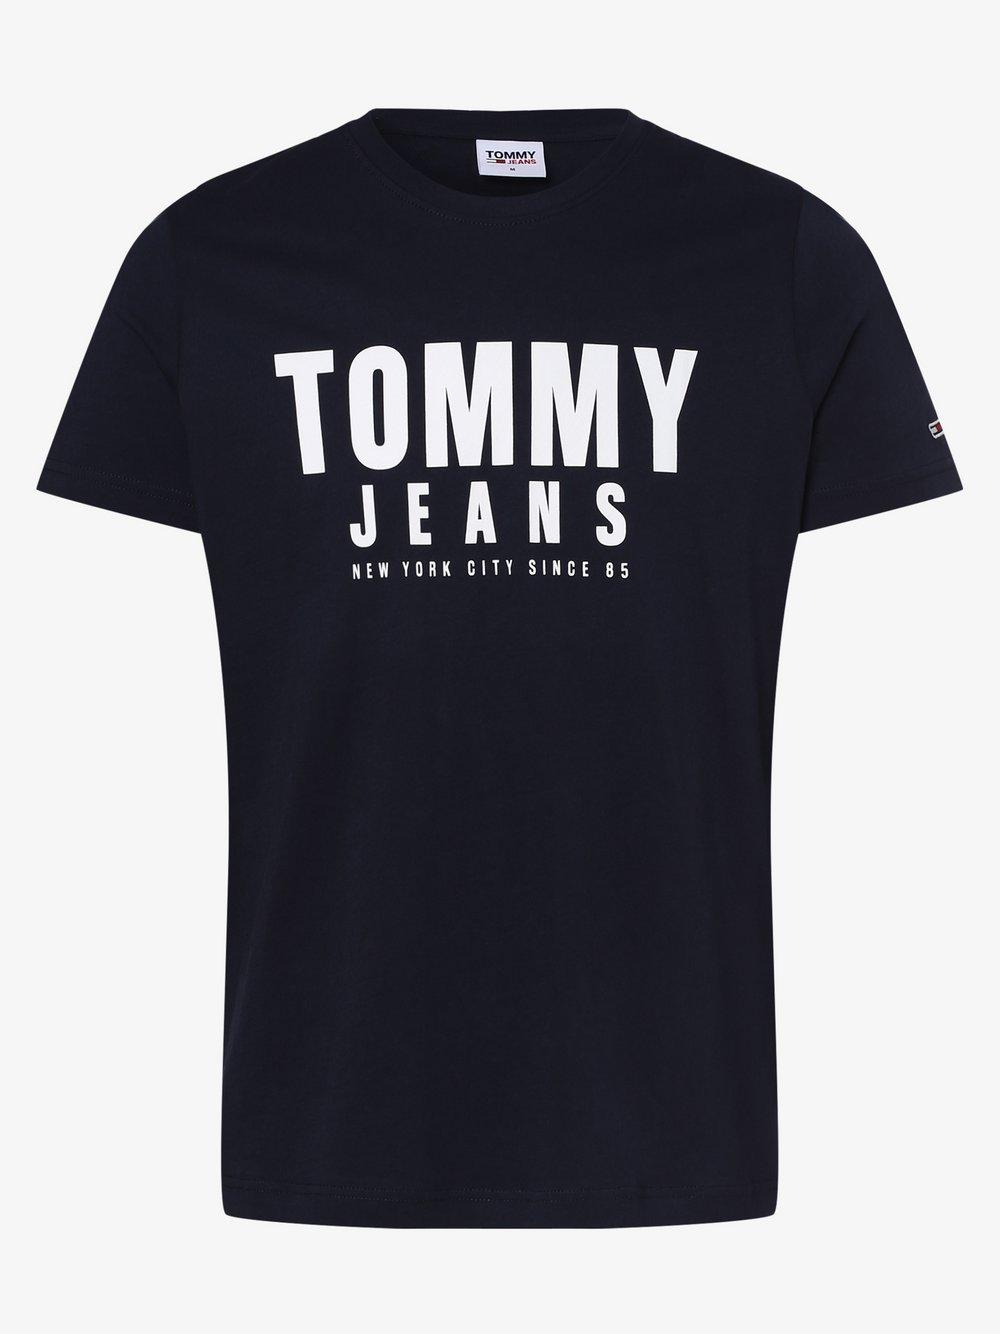 Tommy Jeans - T-shirt męski, niebieski